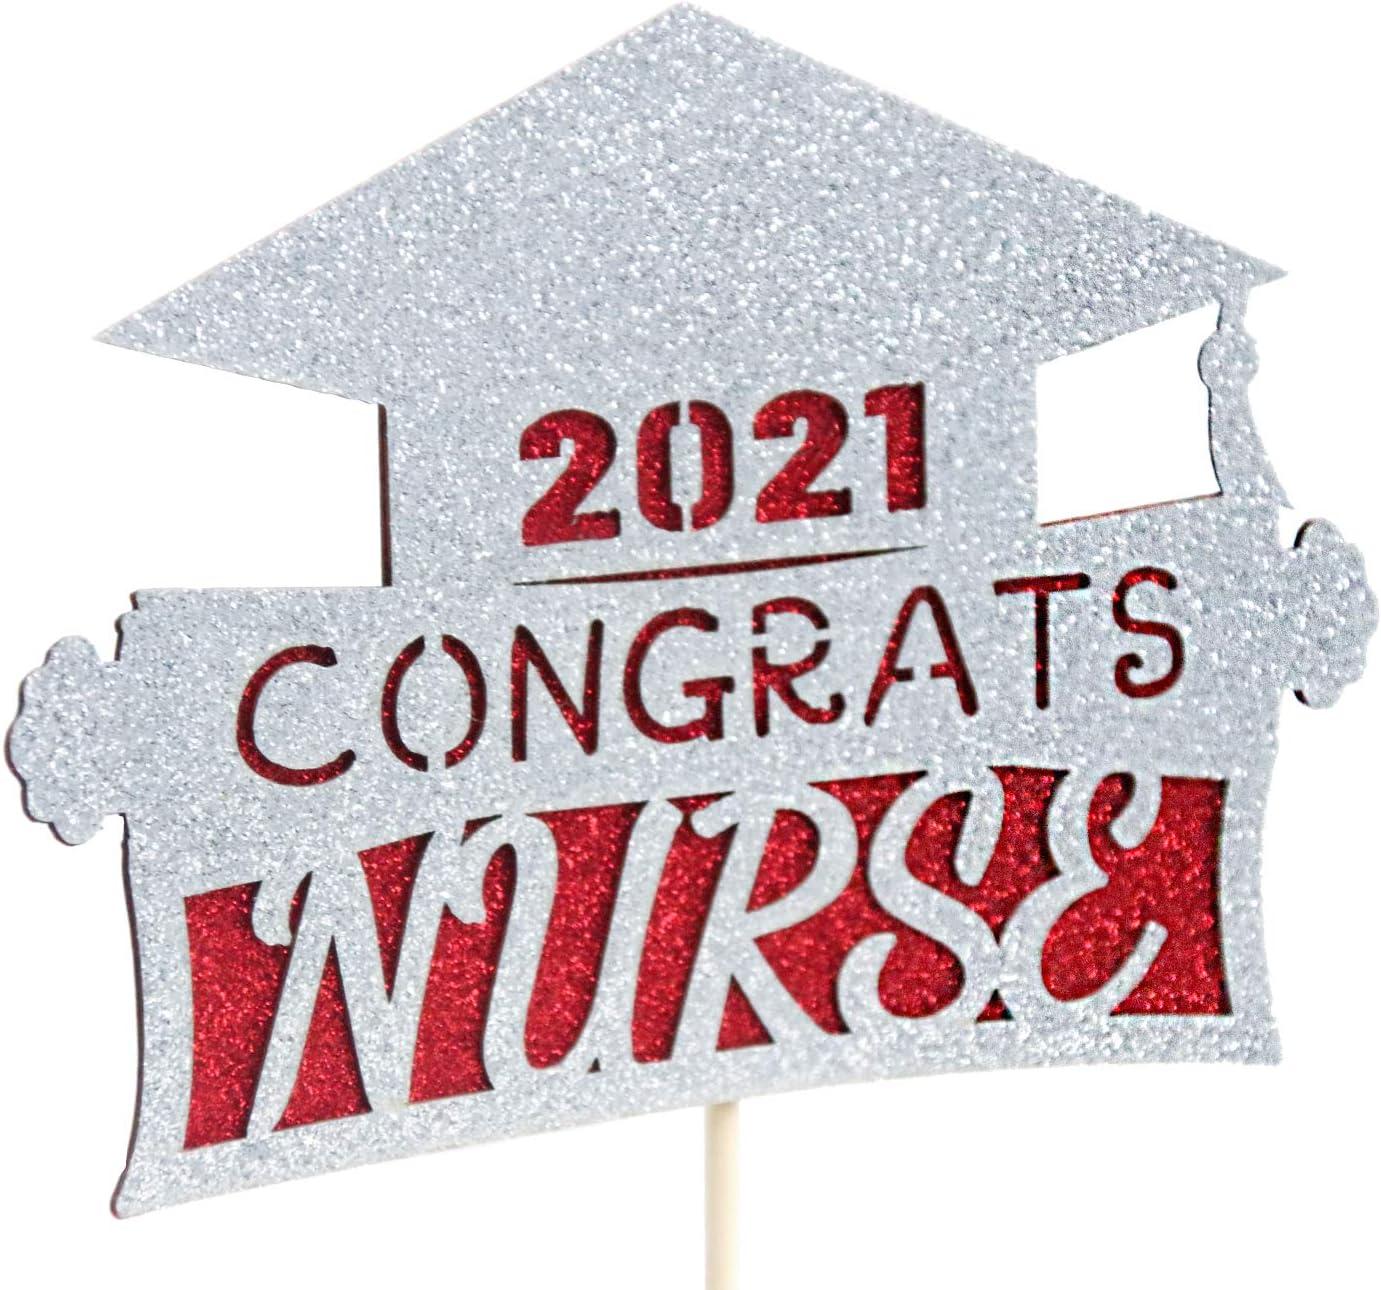 Sliver Congrats 2021 Nurse Glitter Cake Topper Medical School Graduate Party Cake Decor Nursing//BSN//RN Graduation Party Supplies